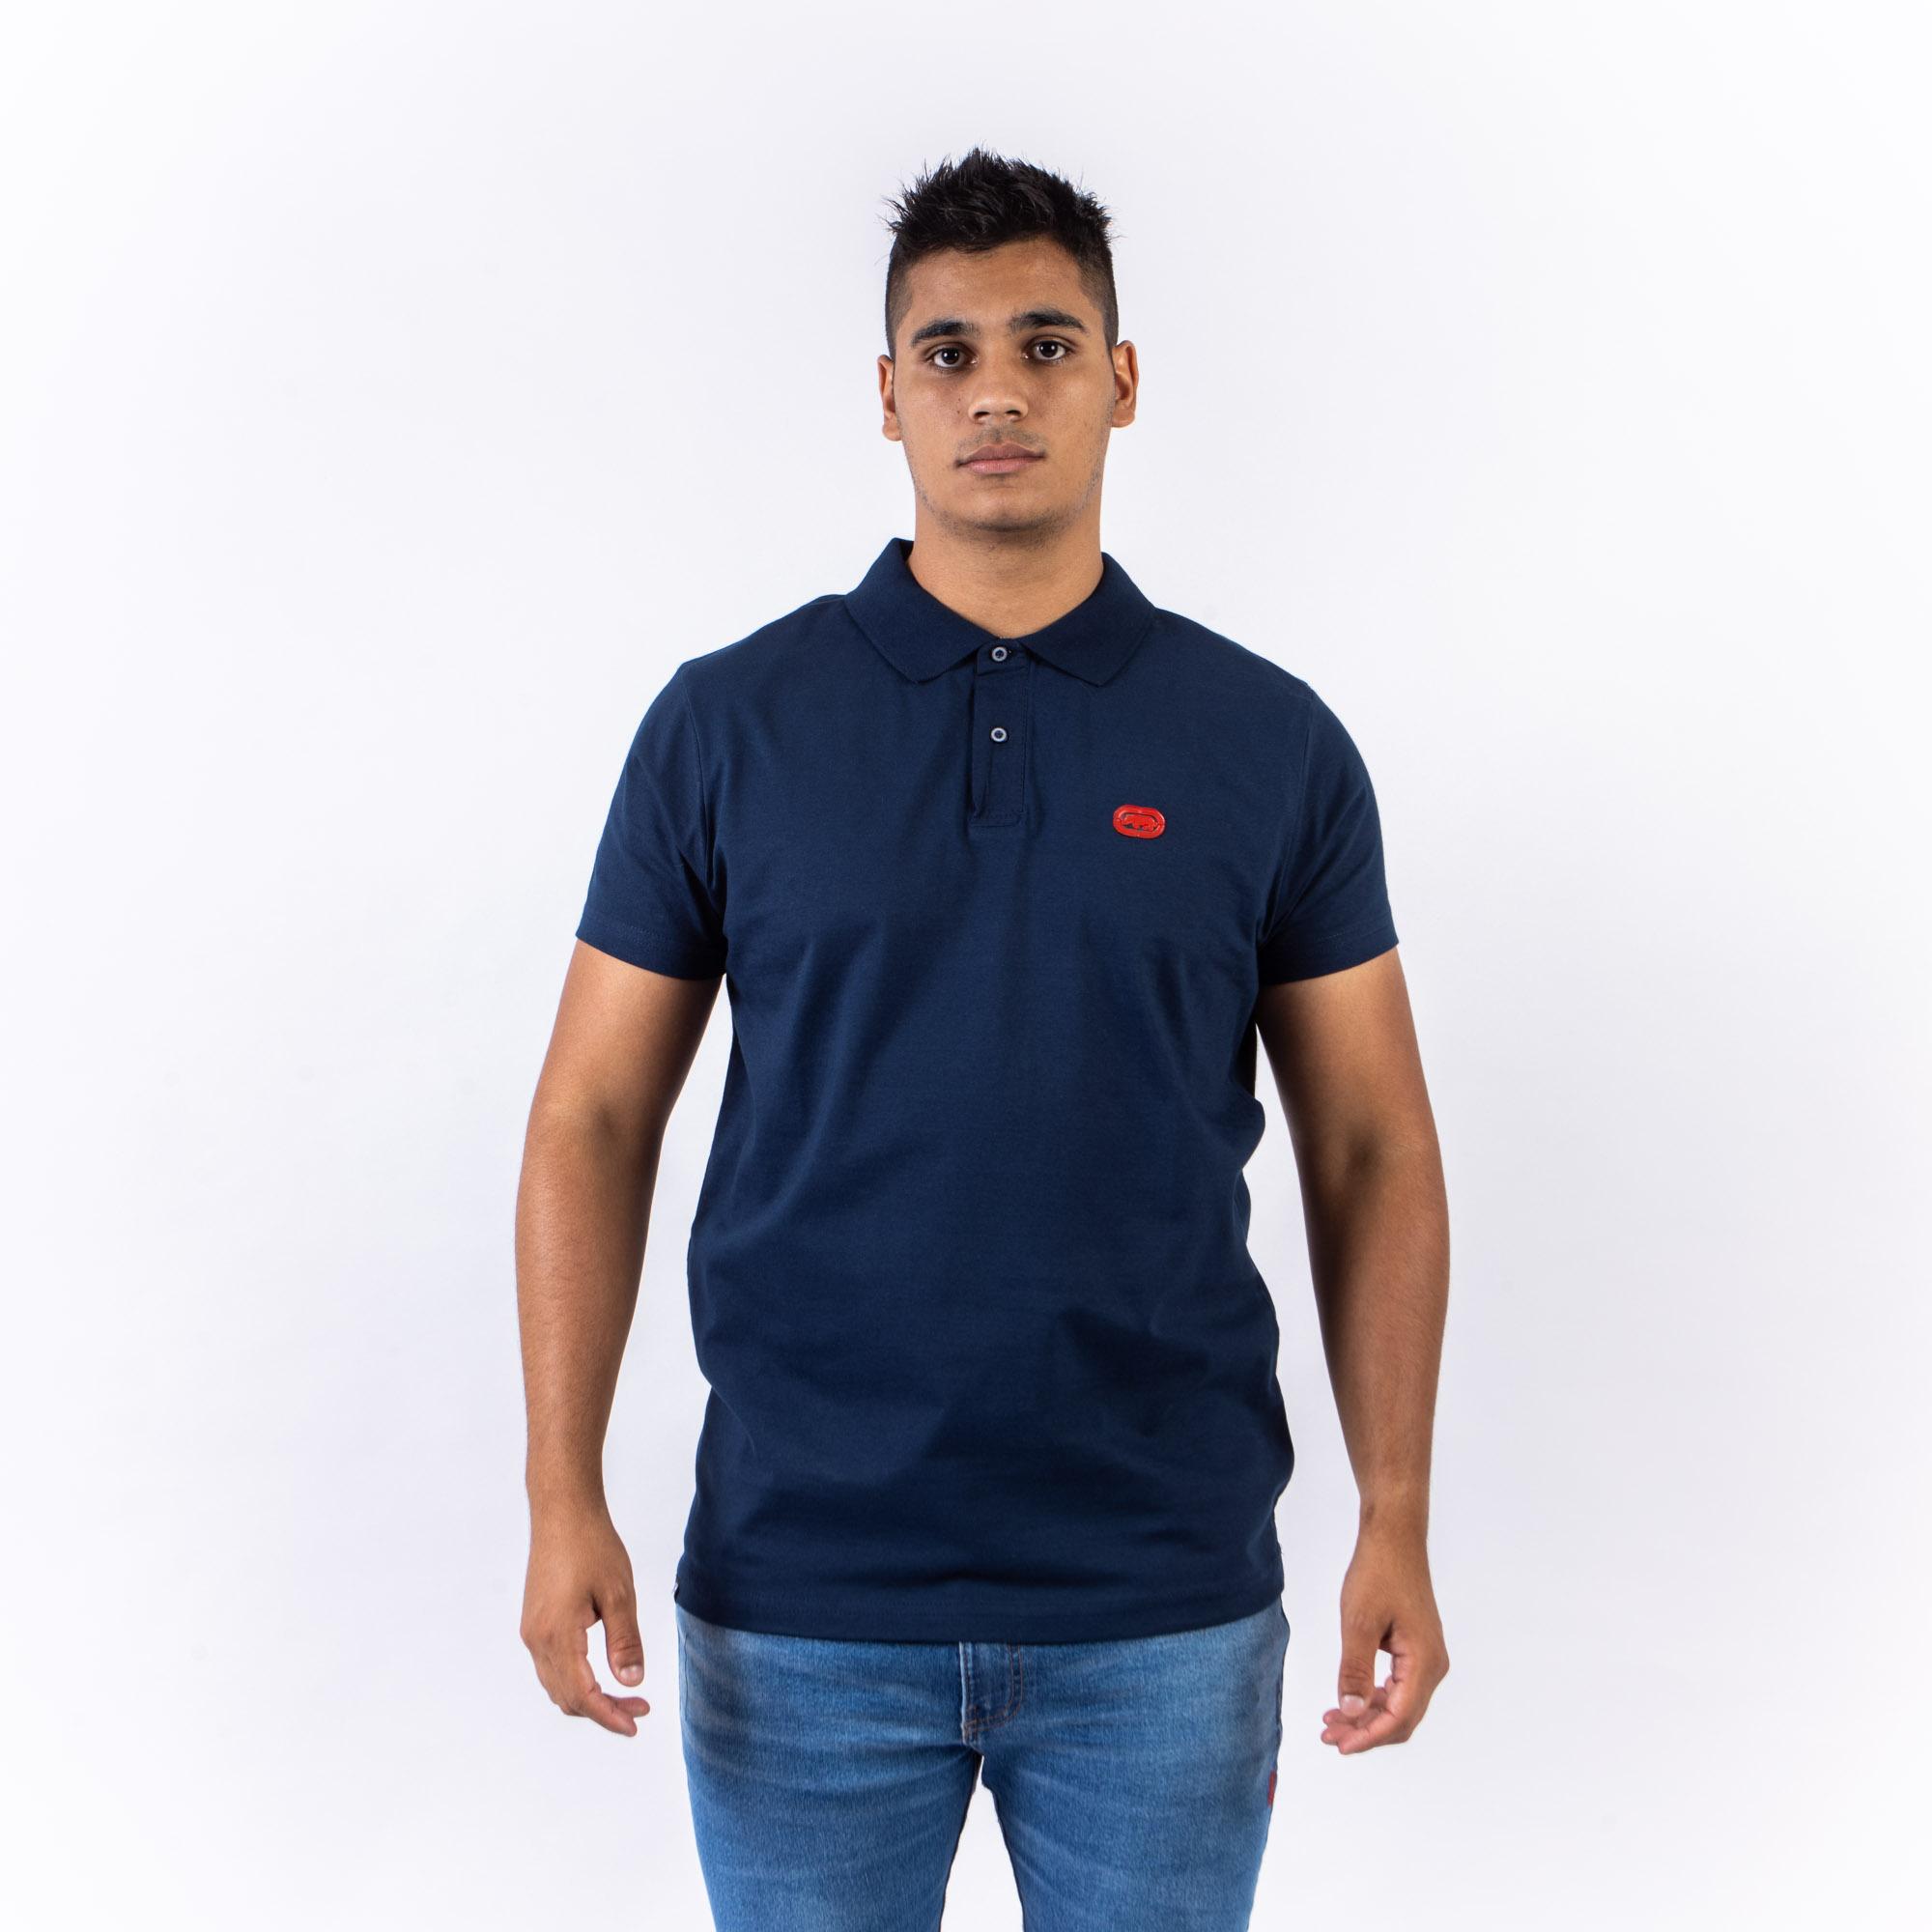 Camiseta Polo Básica -Ecko Unltd